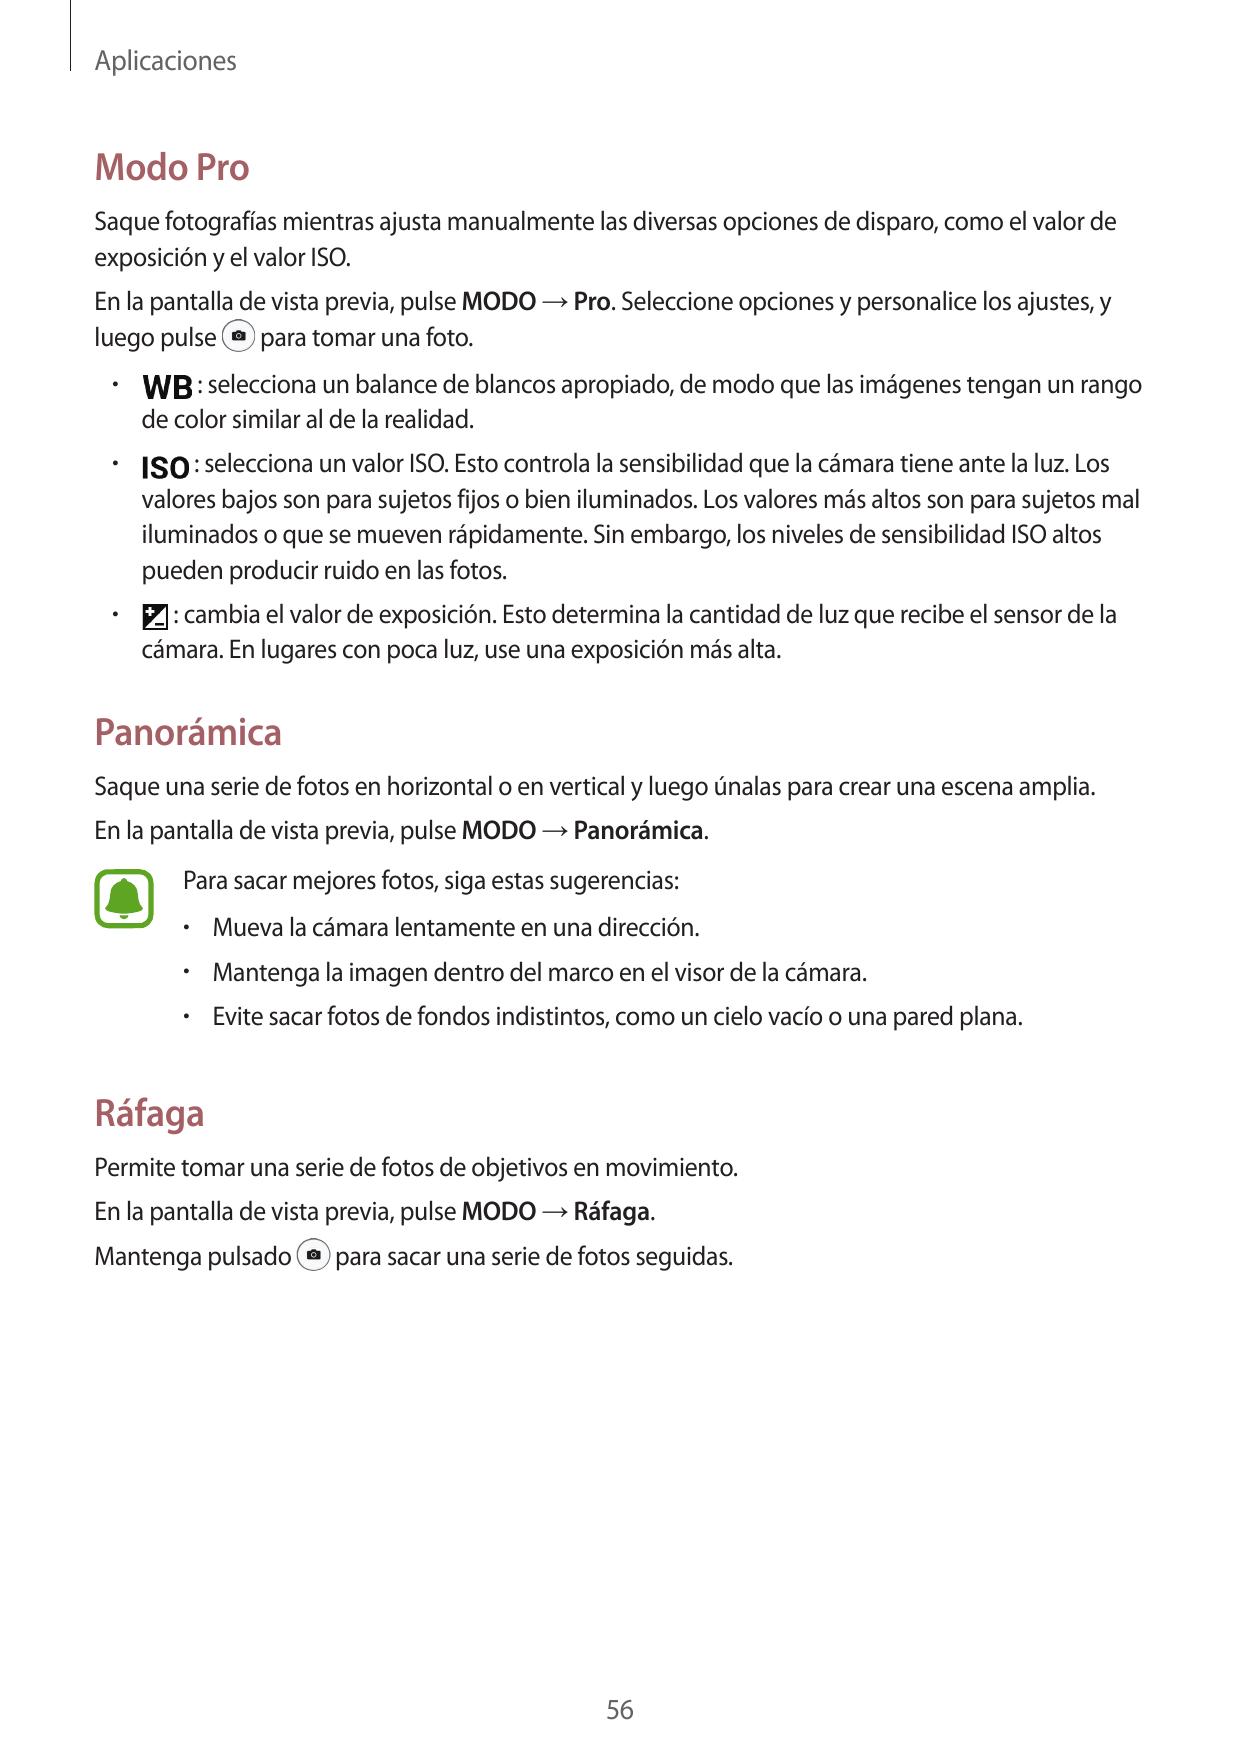 Manual - Samsung Galaxy A7 (2016) - Android 5.1 - Guías Smart